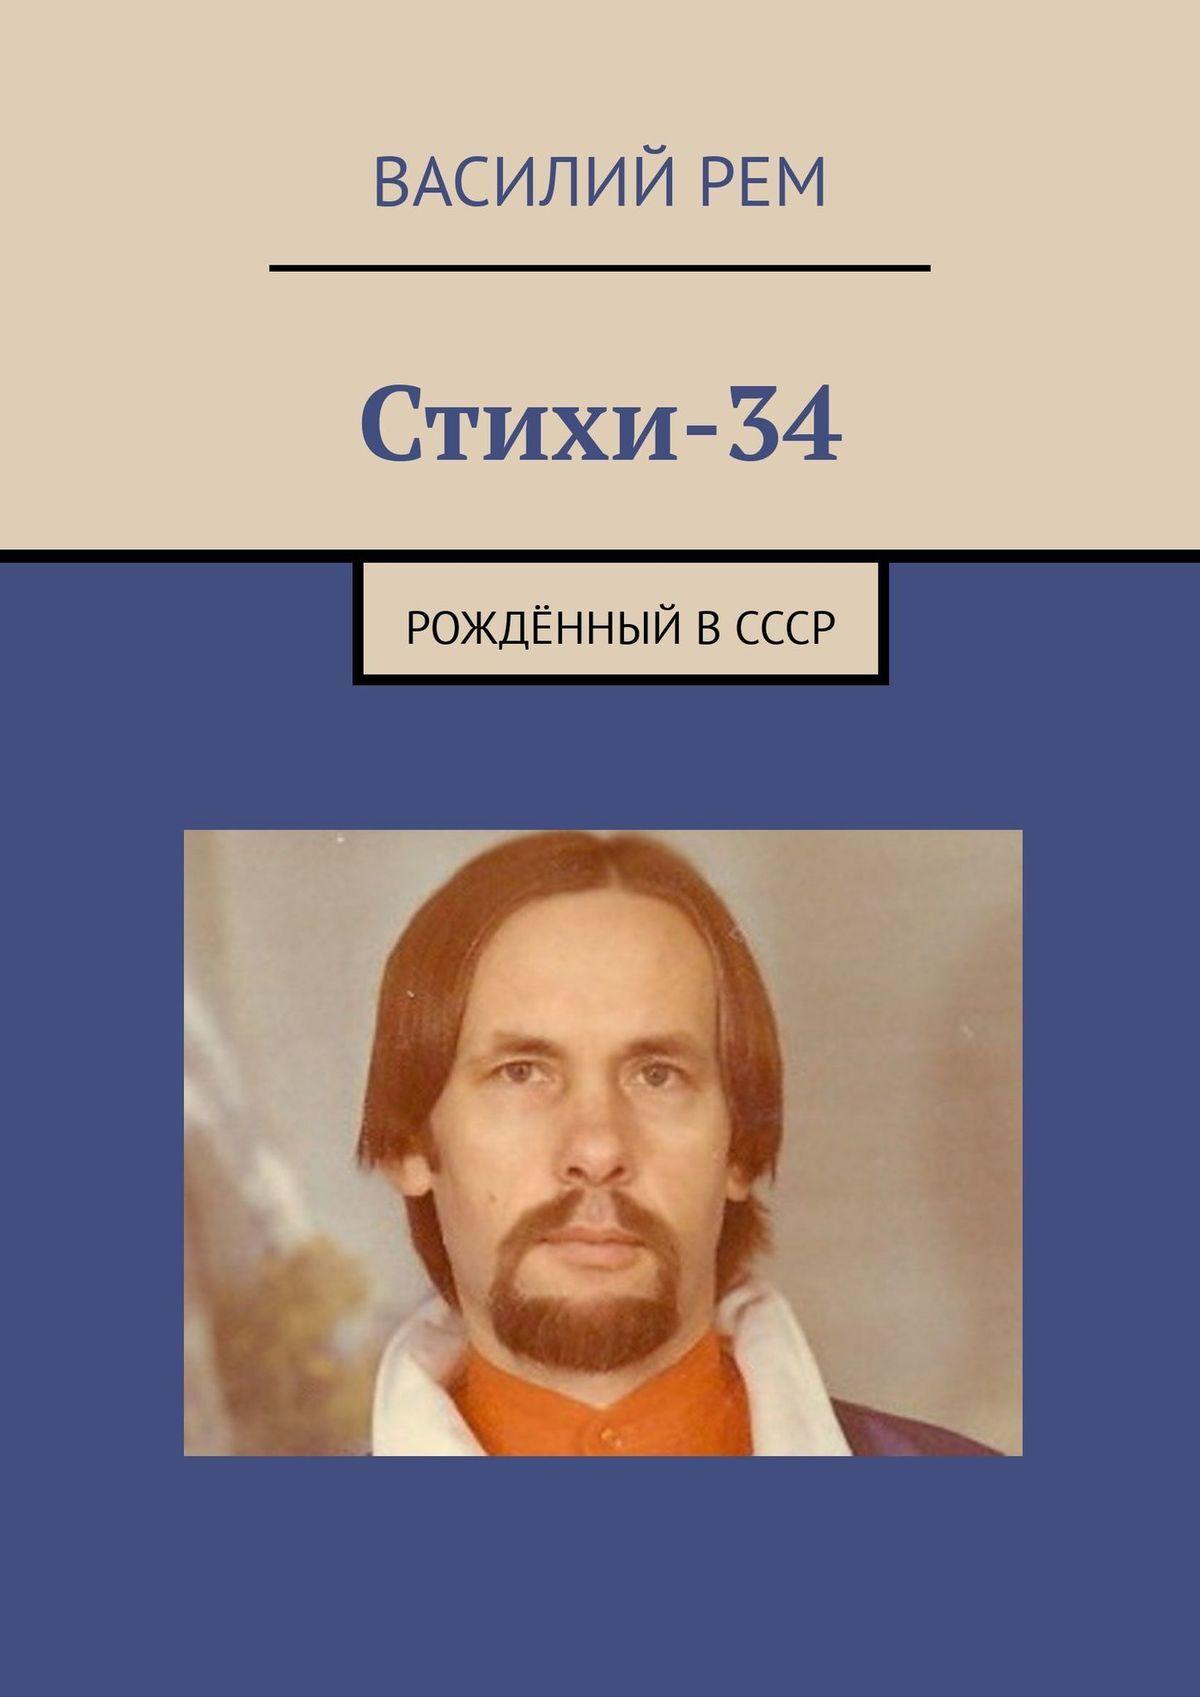 Василий Рем Стихи-34. Рождённый вСССР василий рем стихи длявсех рожденный вссср